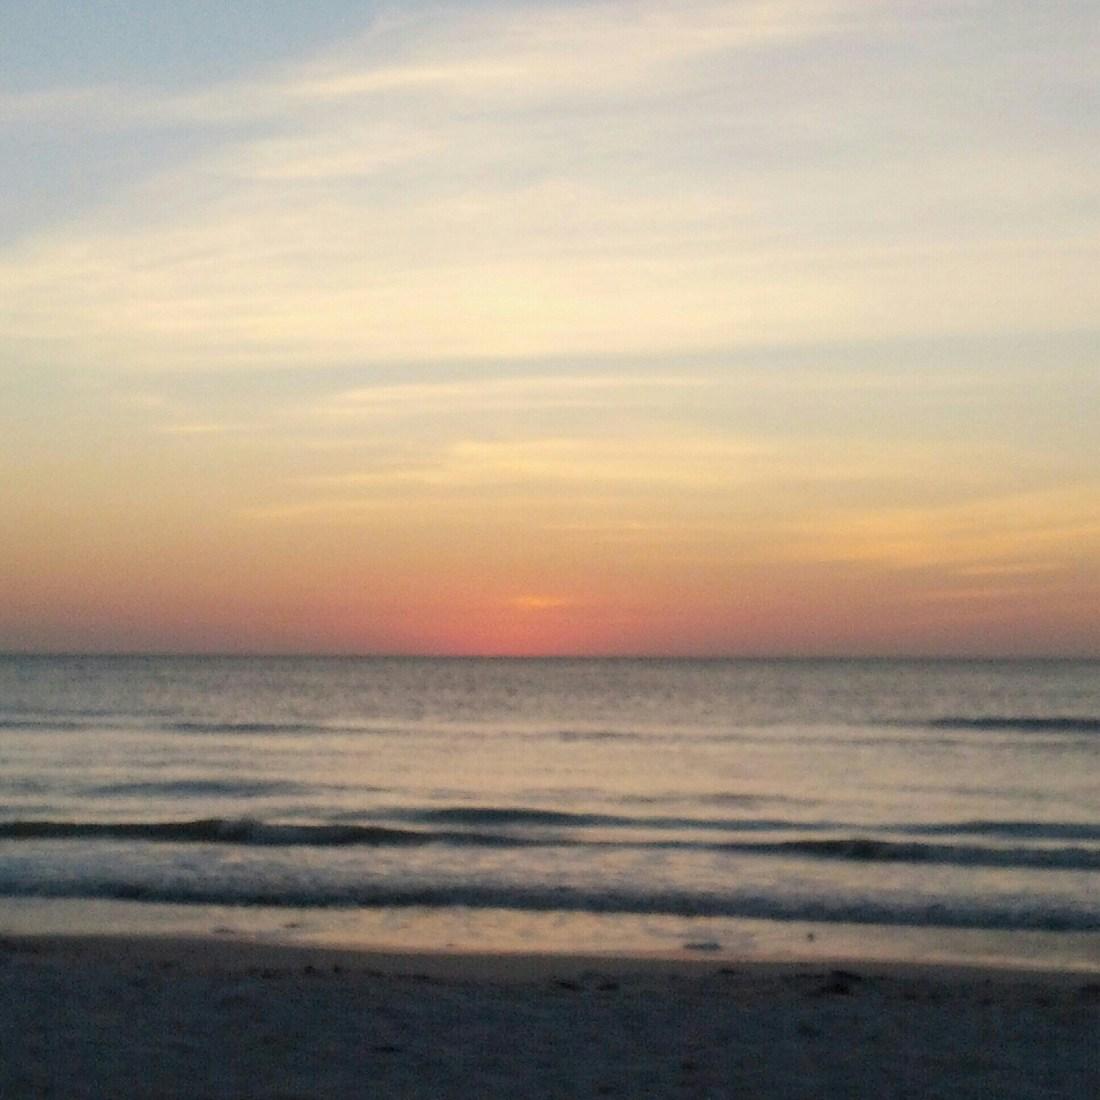 ocean view at sunset